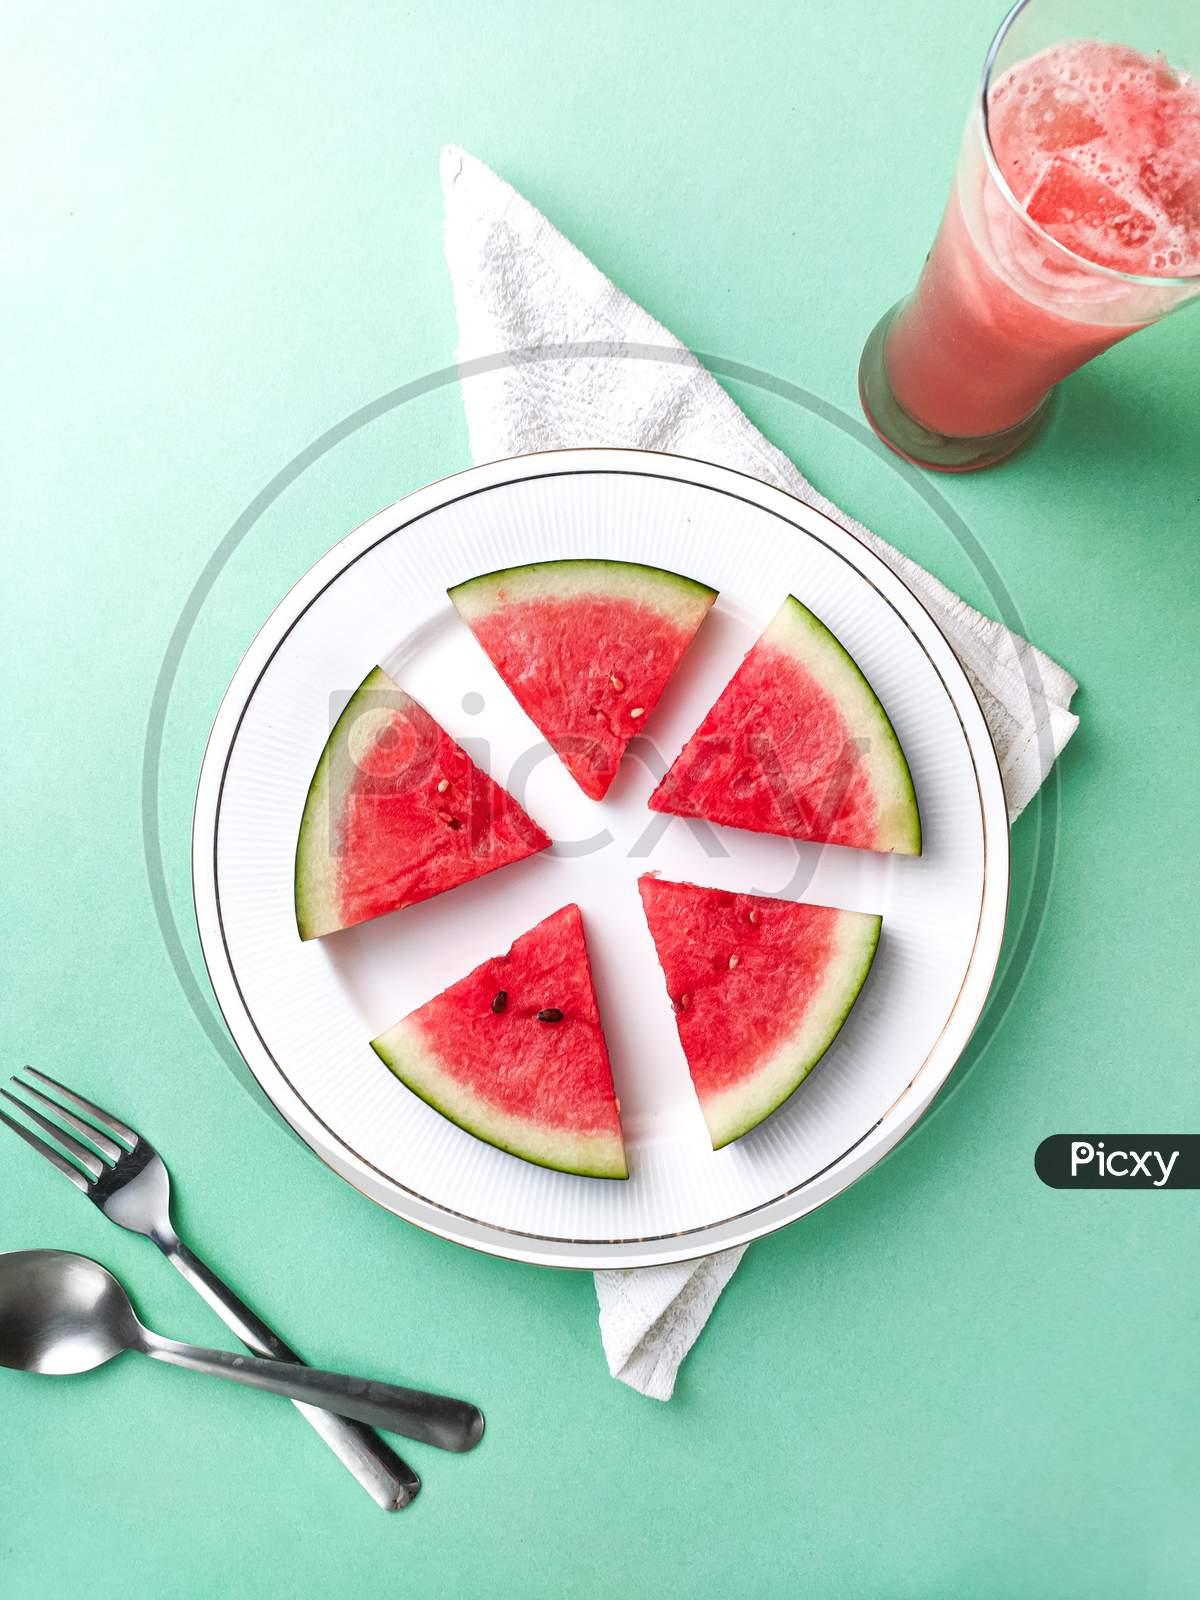 Creative sliced watermelon stock image.